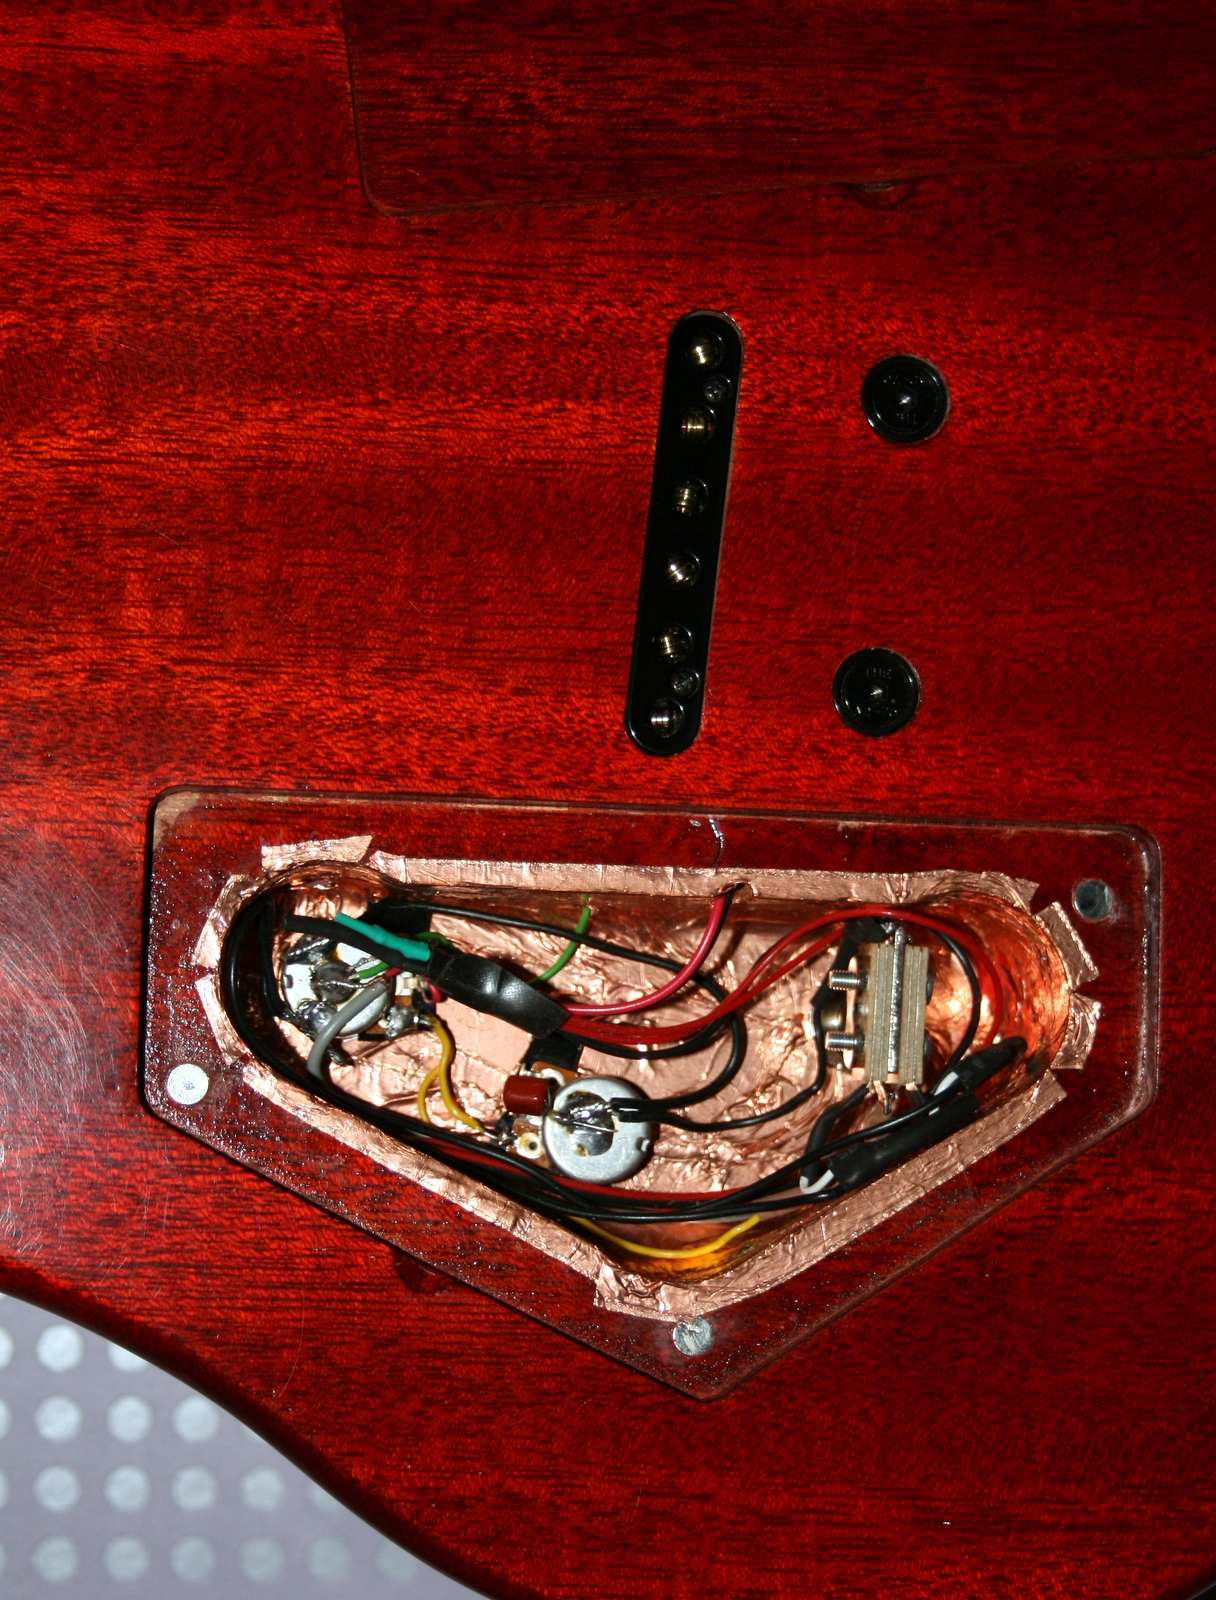 Tmc Woodworks  Baritone Guitar Build Part 9